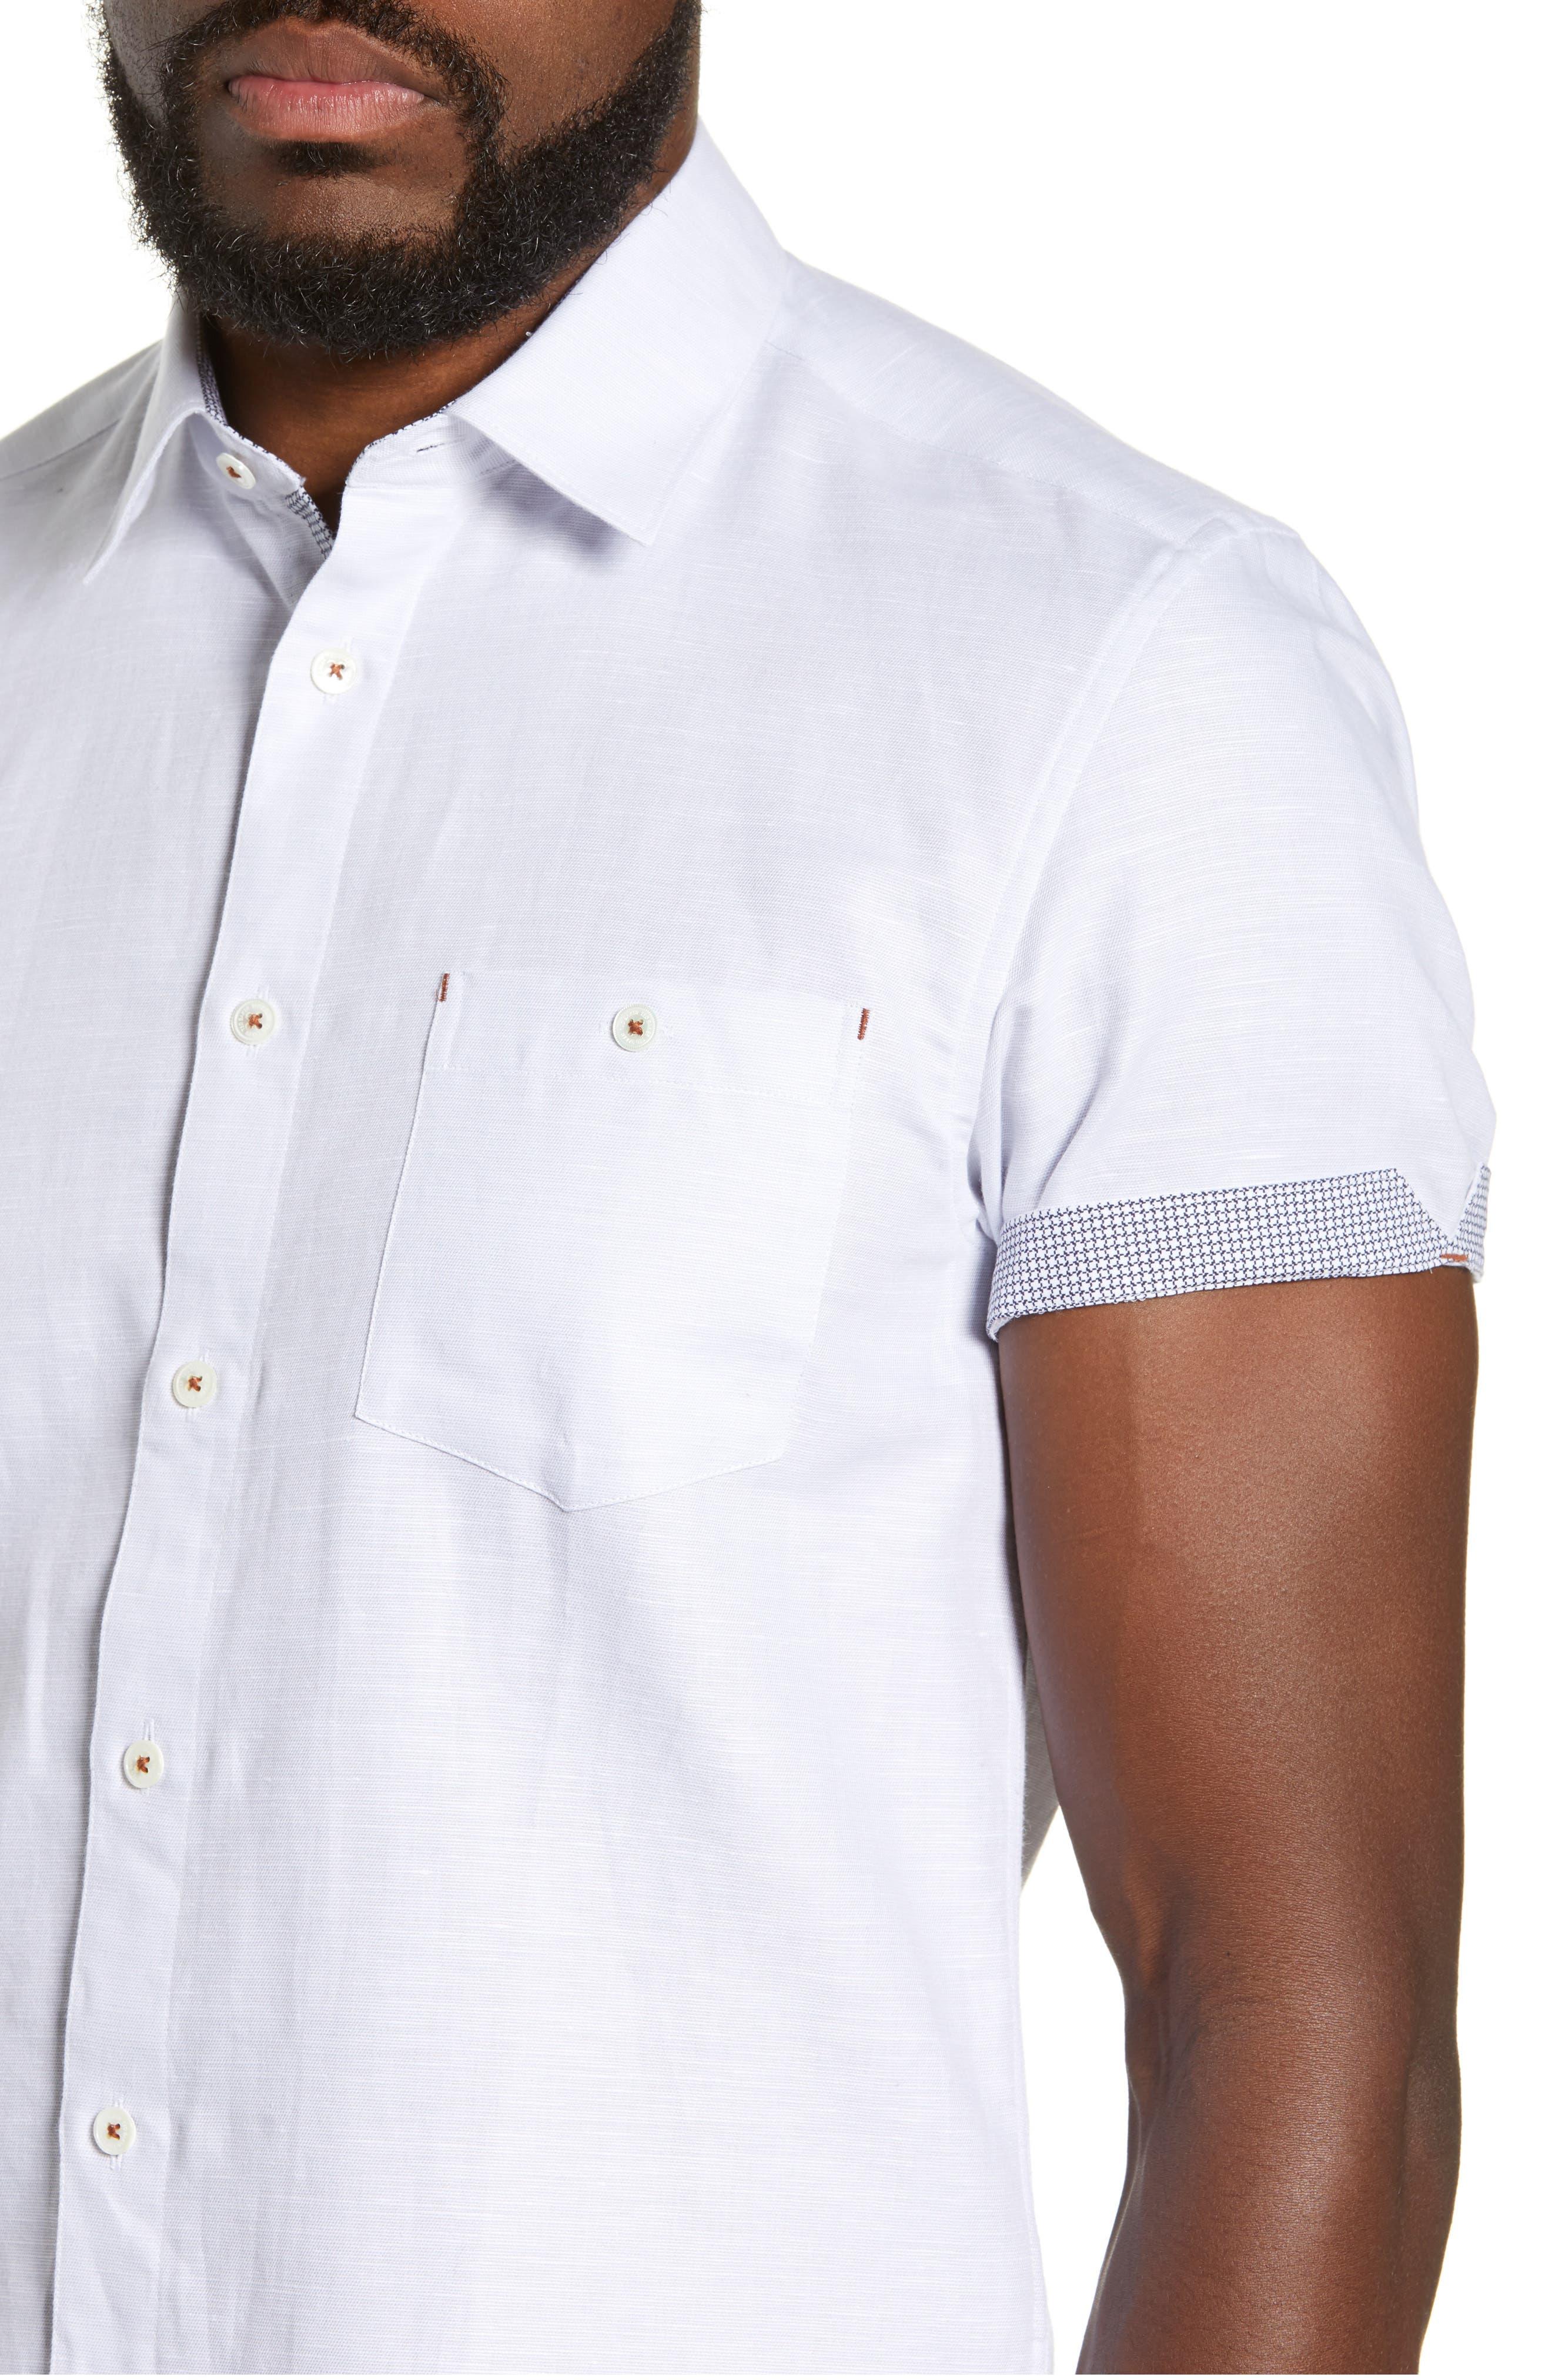 TED BAKER LONDON, Graphit Slim Fit Cotton & Linen Sport Shirt, Alternate thumbnail 2, color, GREY